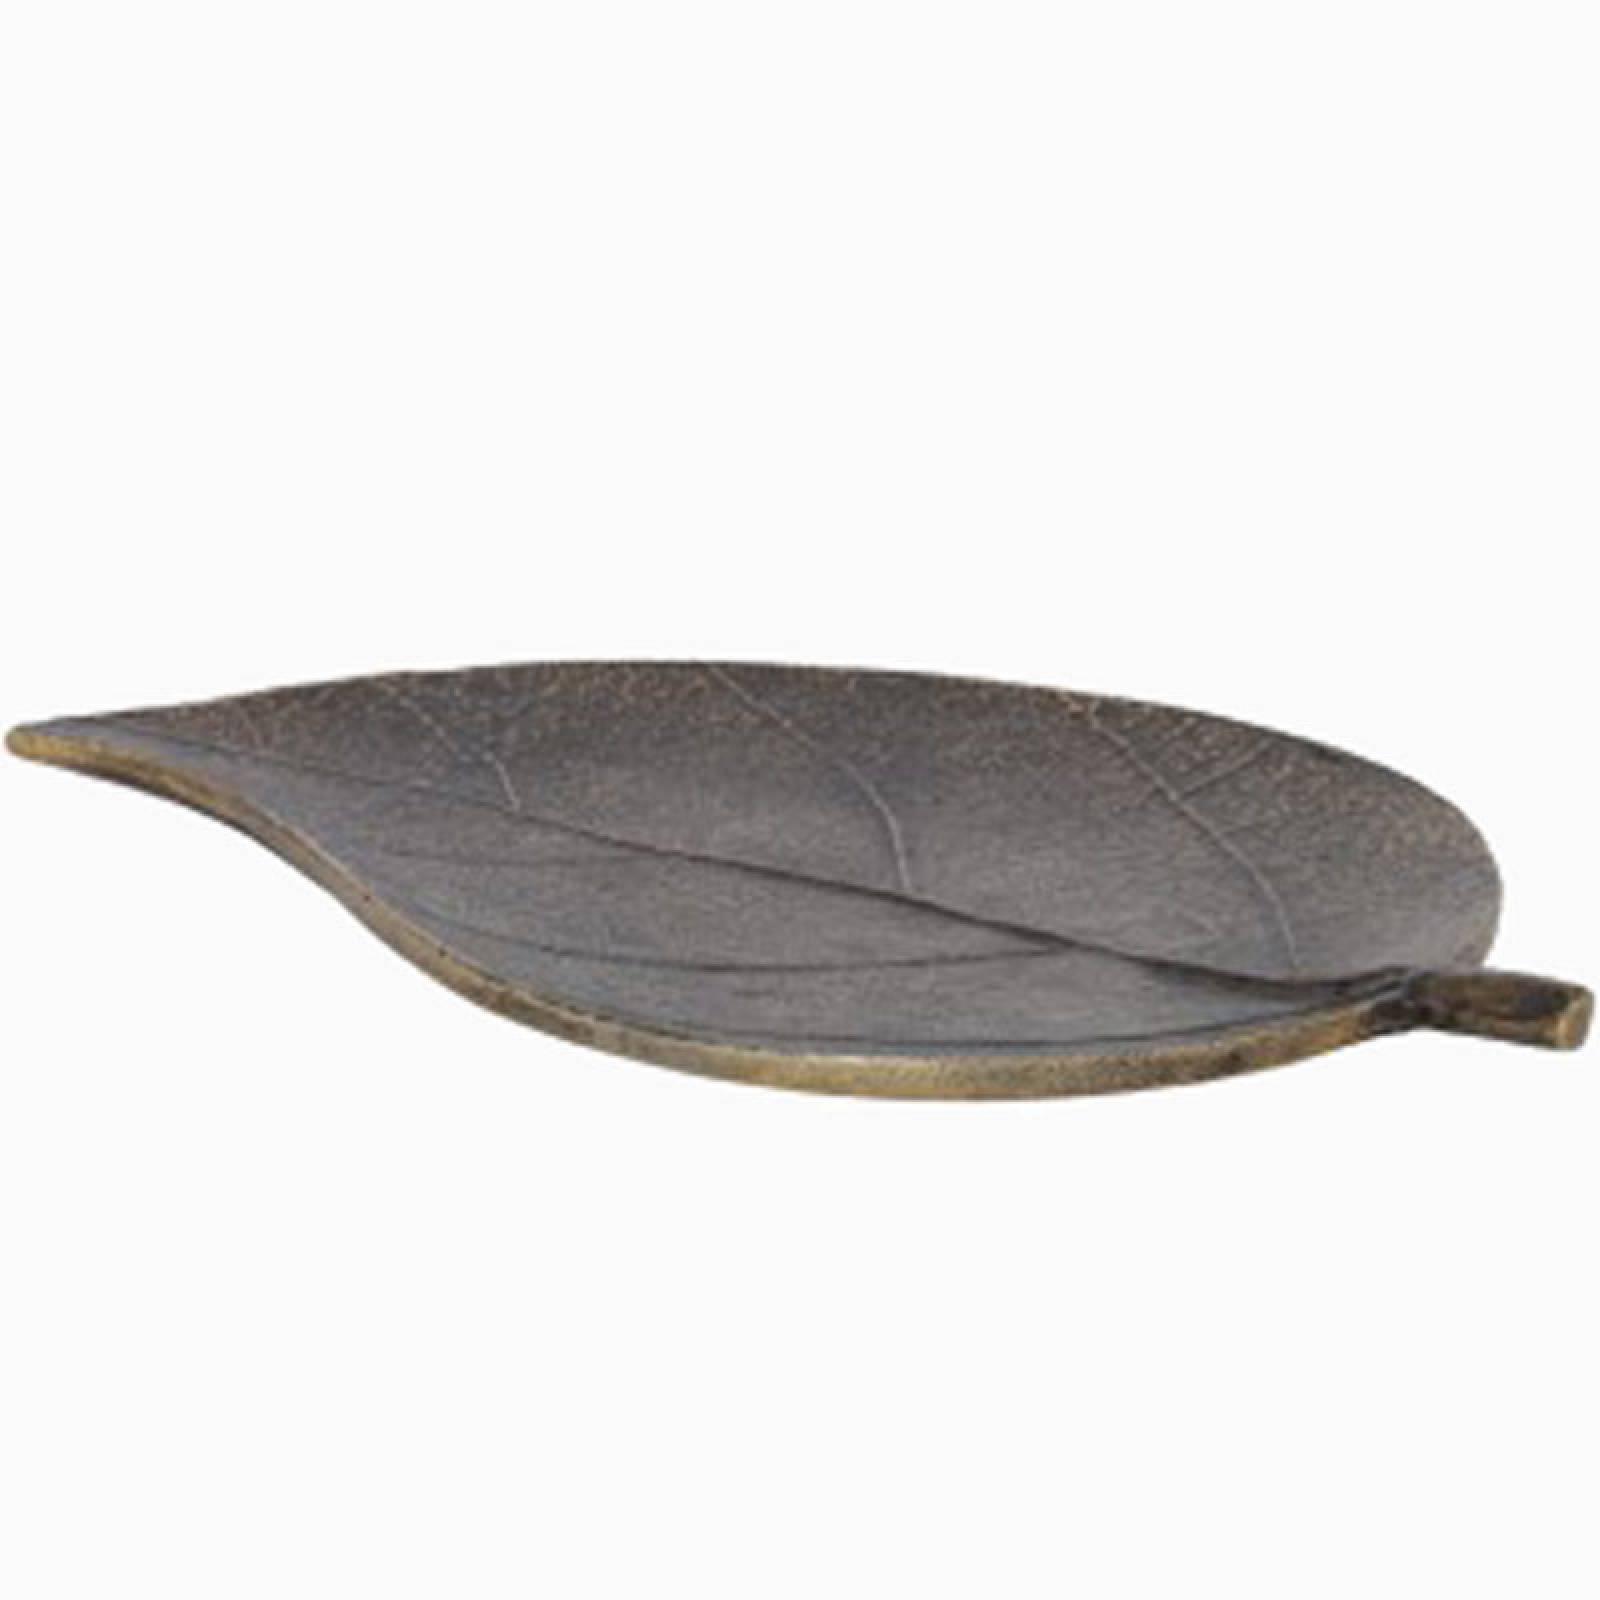 Leaf Dish Bronze Metal